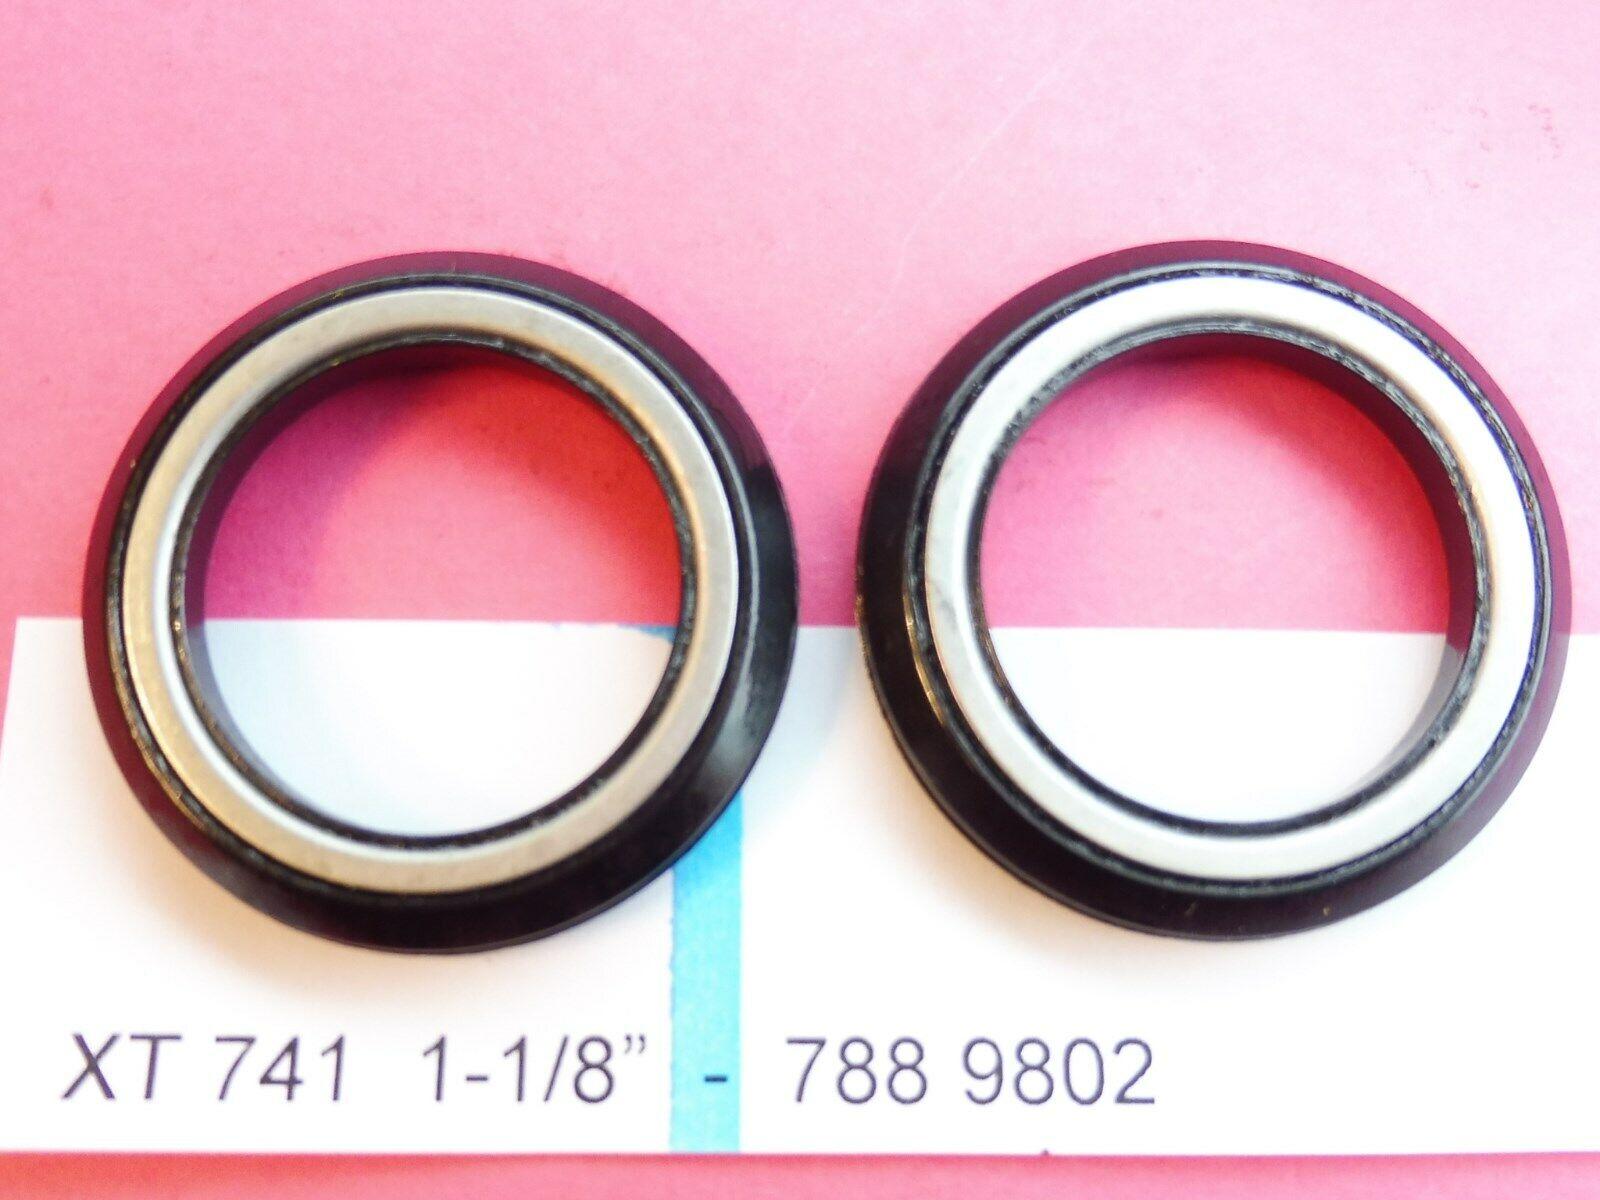 Shimano XT 741  Replacement Ball Bearing Set 788 9802 (Headset) - Numbers MTB Retro  fitness retailer